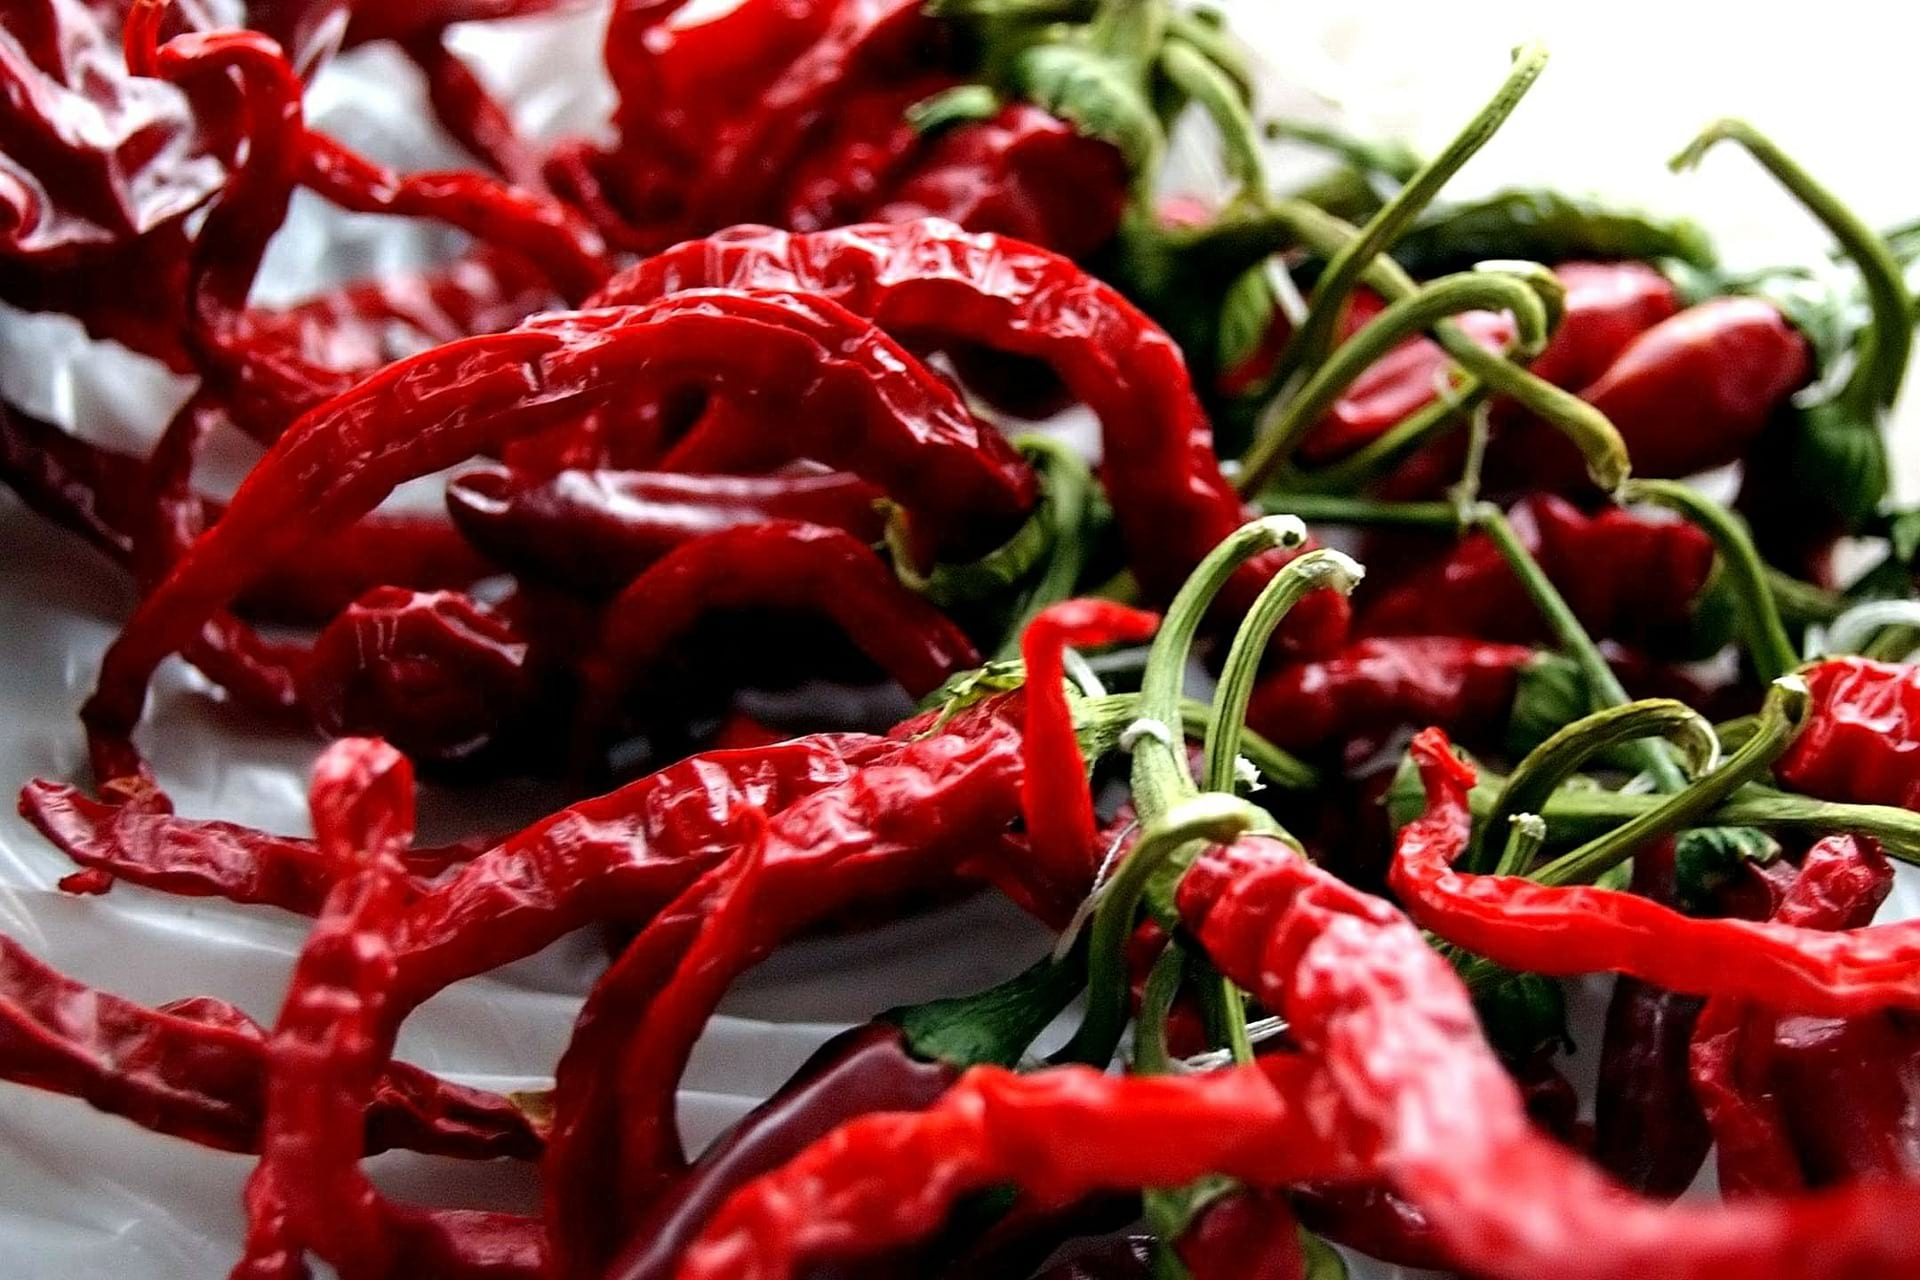 Chilis Image